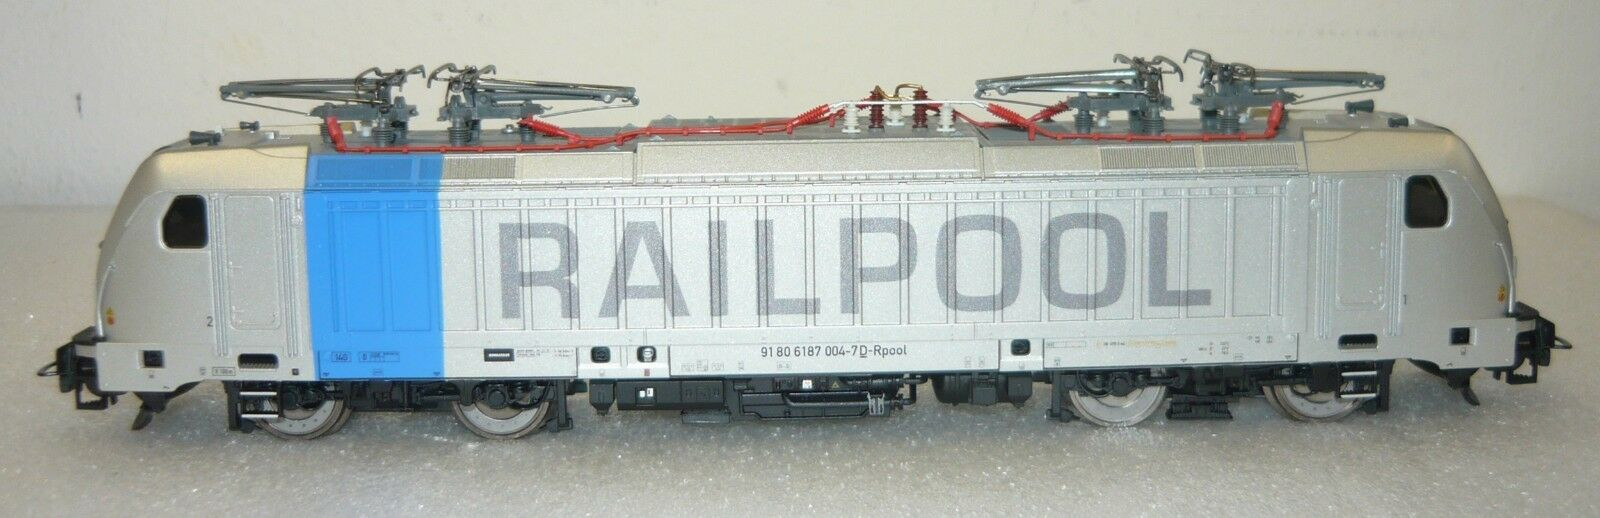 Piko 51564-2, ellok br 187  railpool , dig., plux22, Loksound, EP. vi, h0, neu&ovp